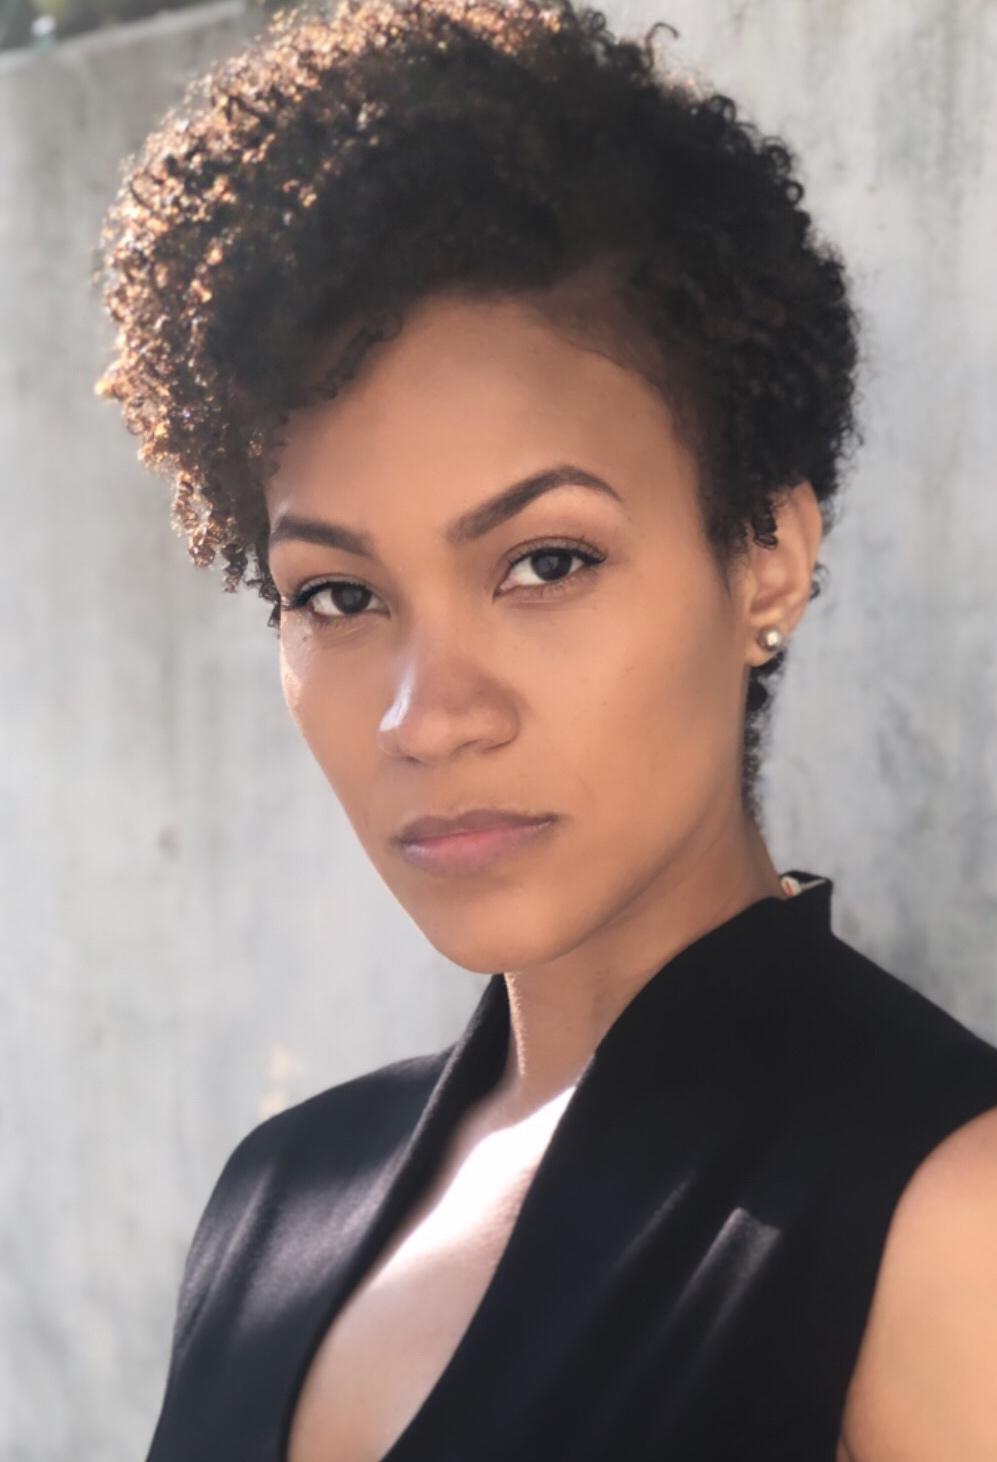 Sasha Kelly Jackson Headshot 2019.JPG